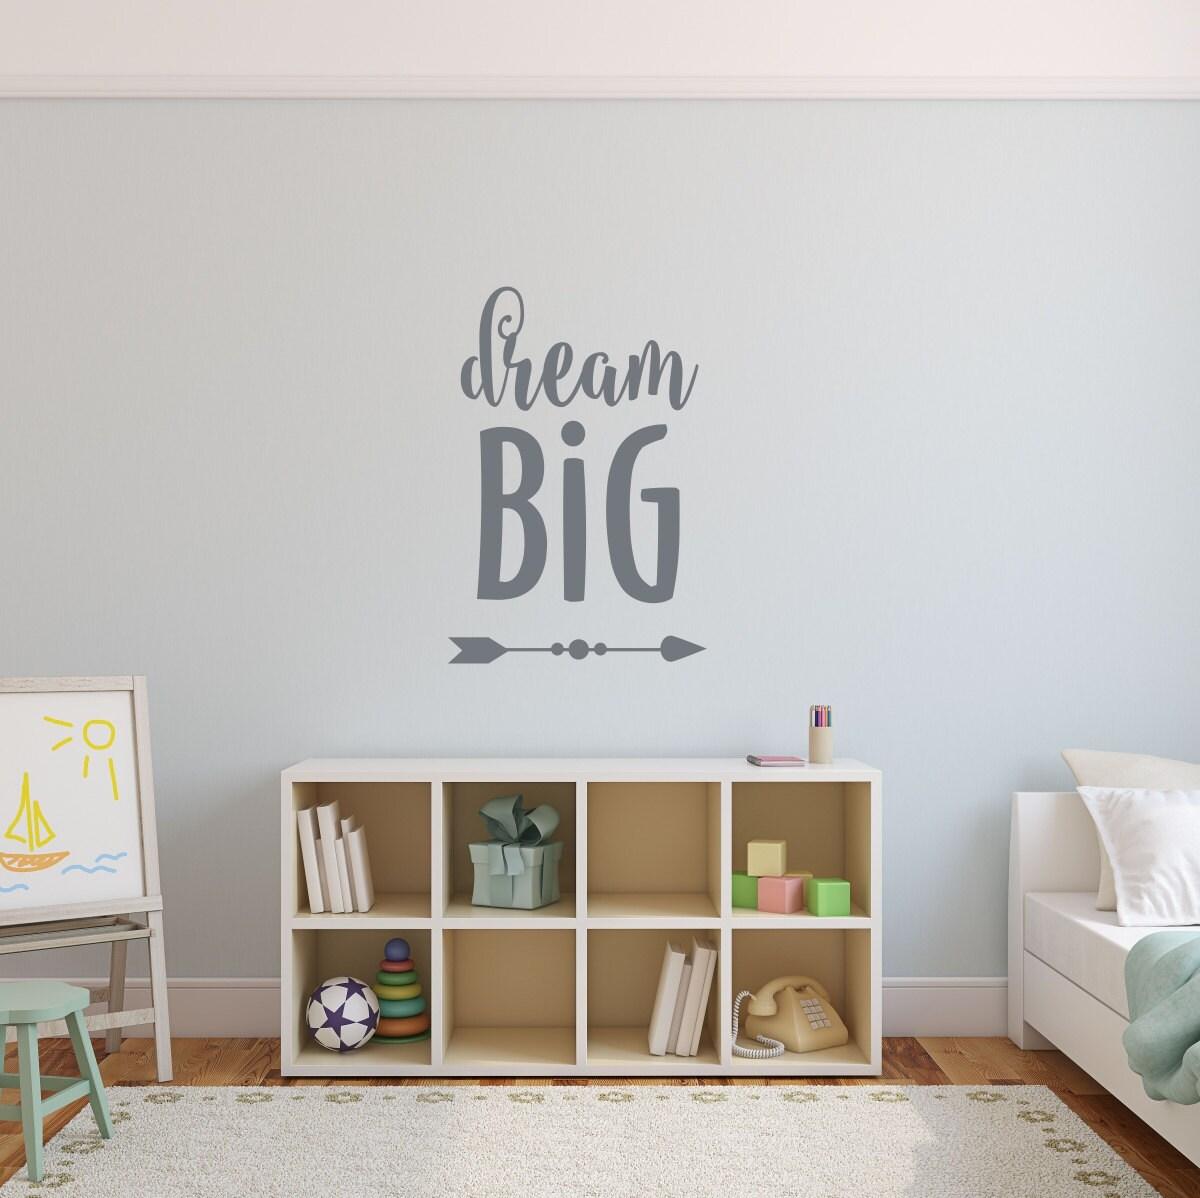 Dream big wall decal nursery decor for boys playroom wall art amipublicfo Images